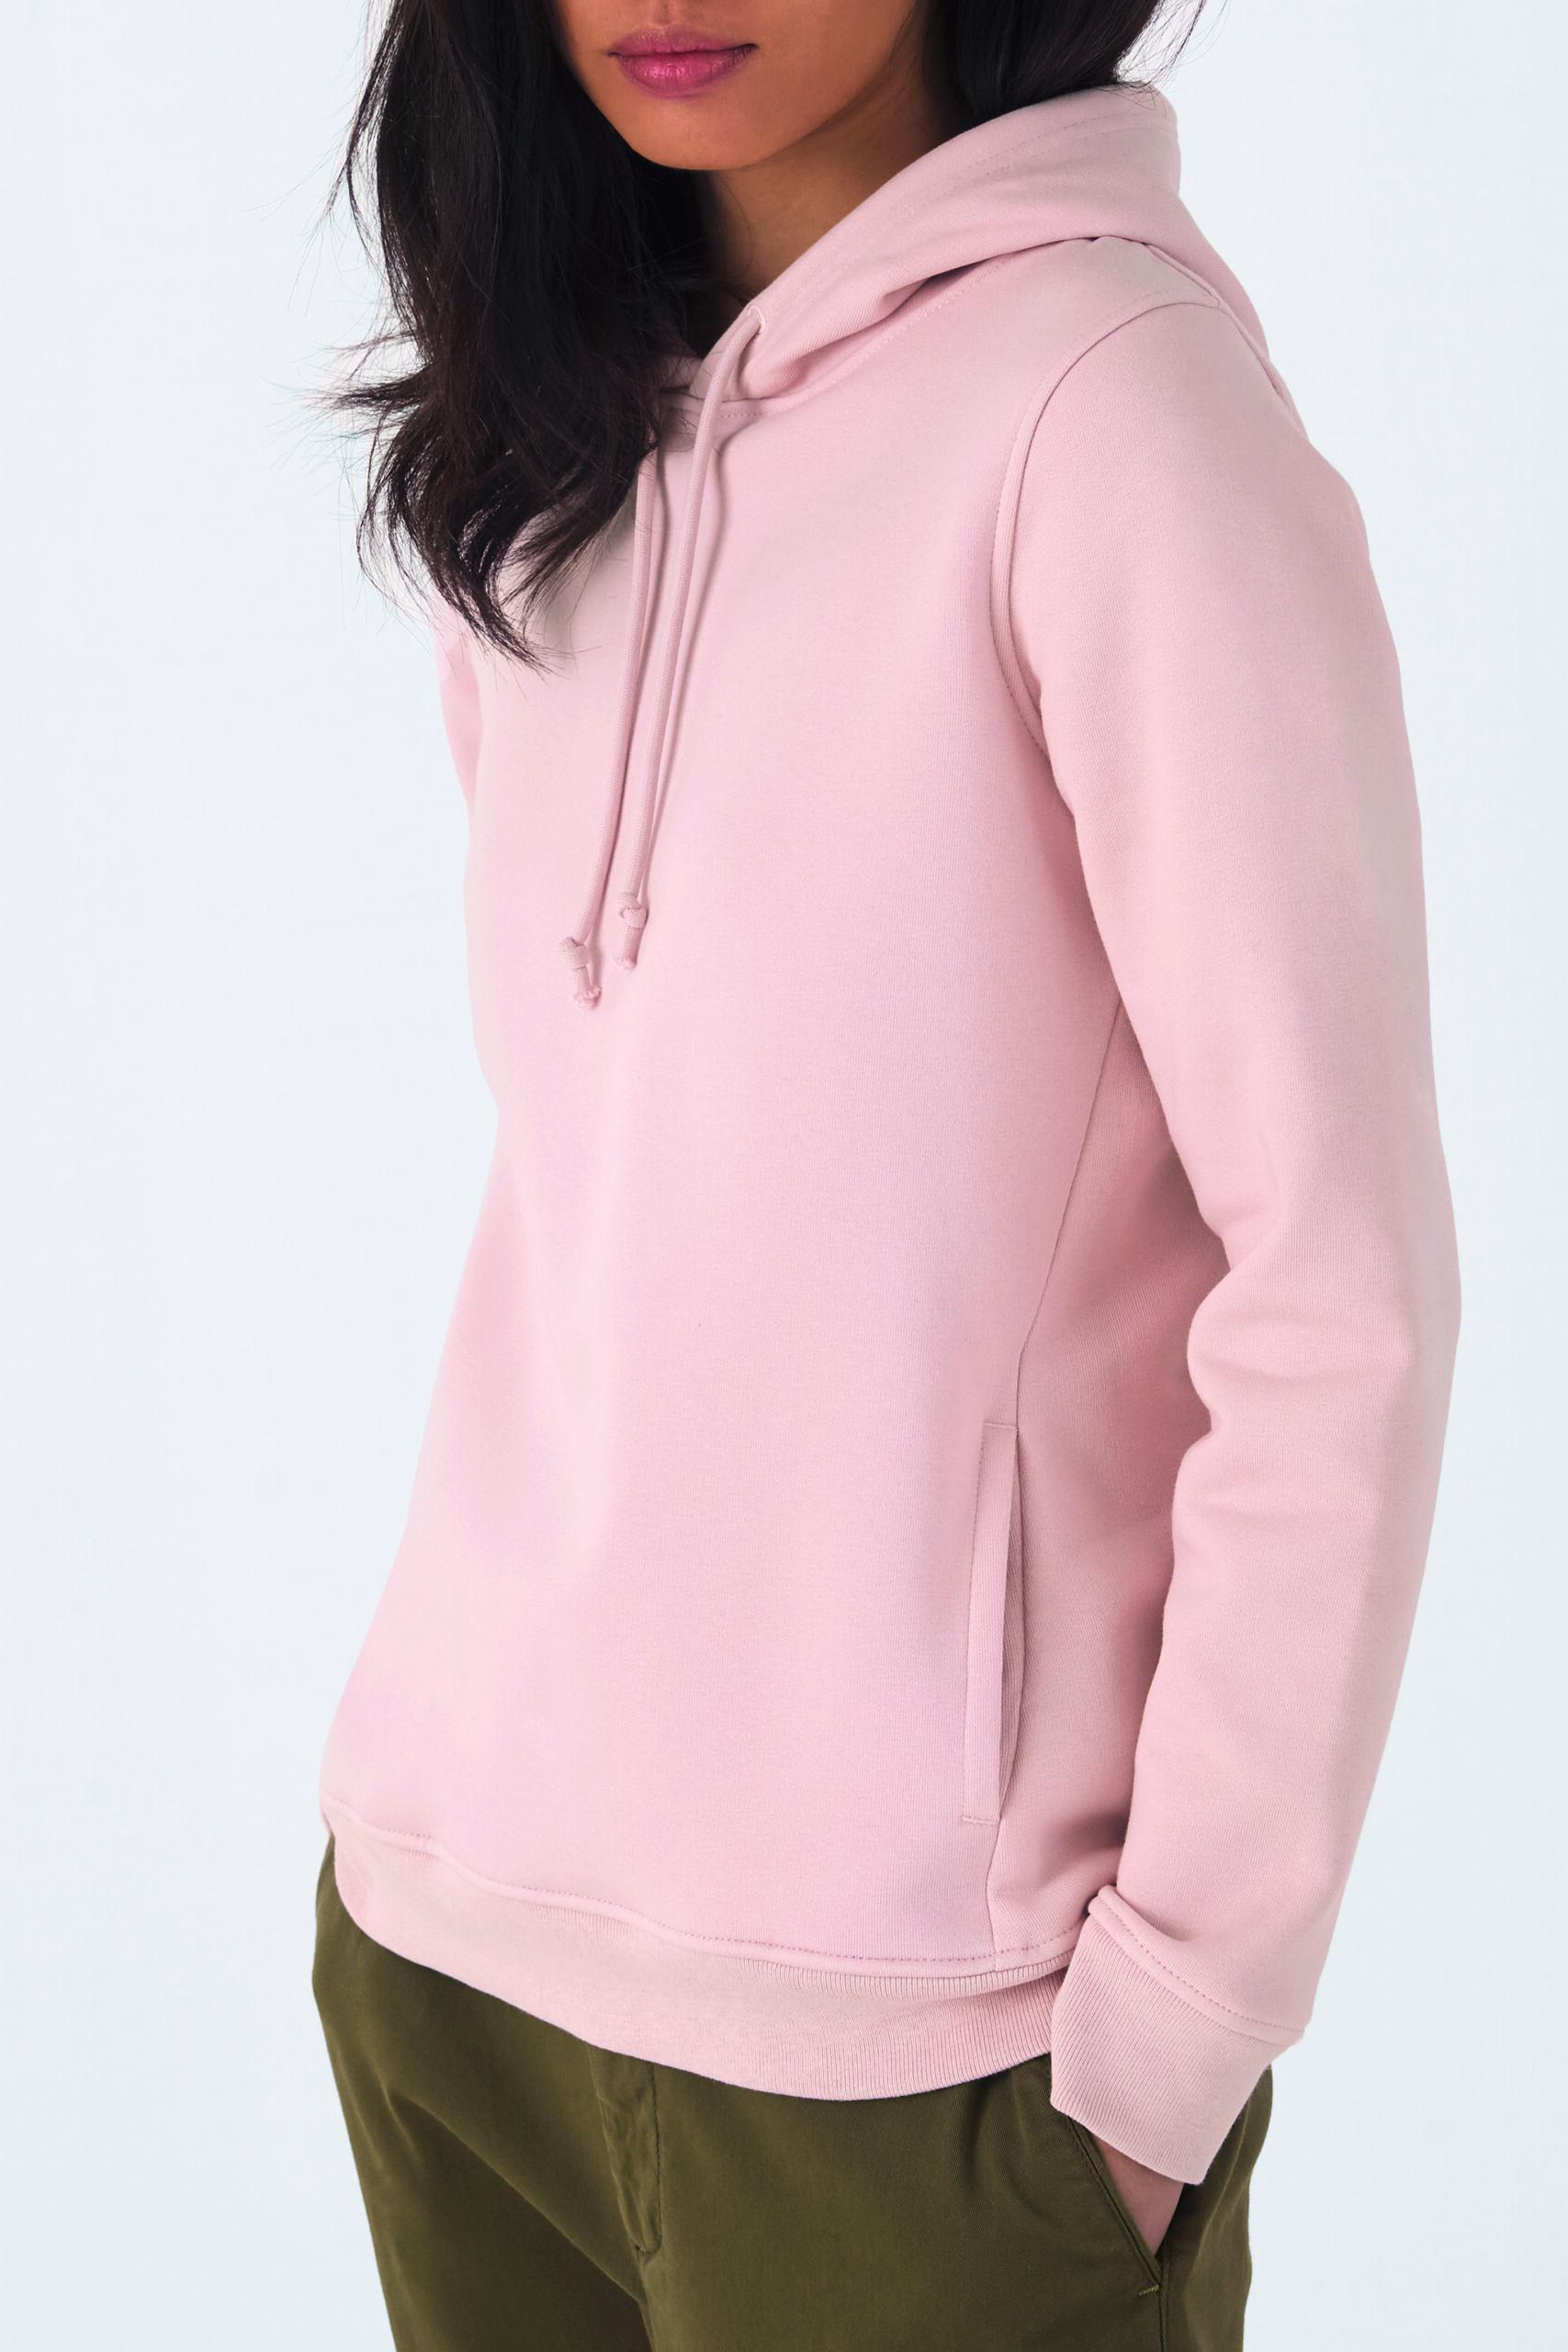 Økologisk Kvinde Hoodie Sweatshirt I En 280g/m2 Kvalitet [BCWW34B]